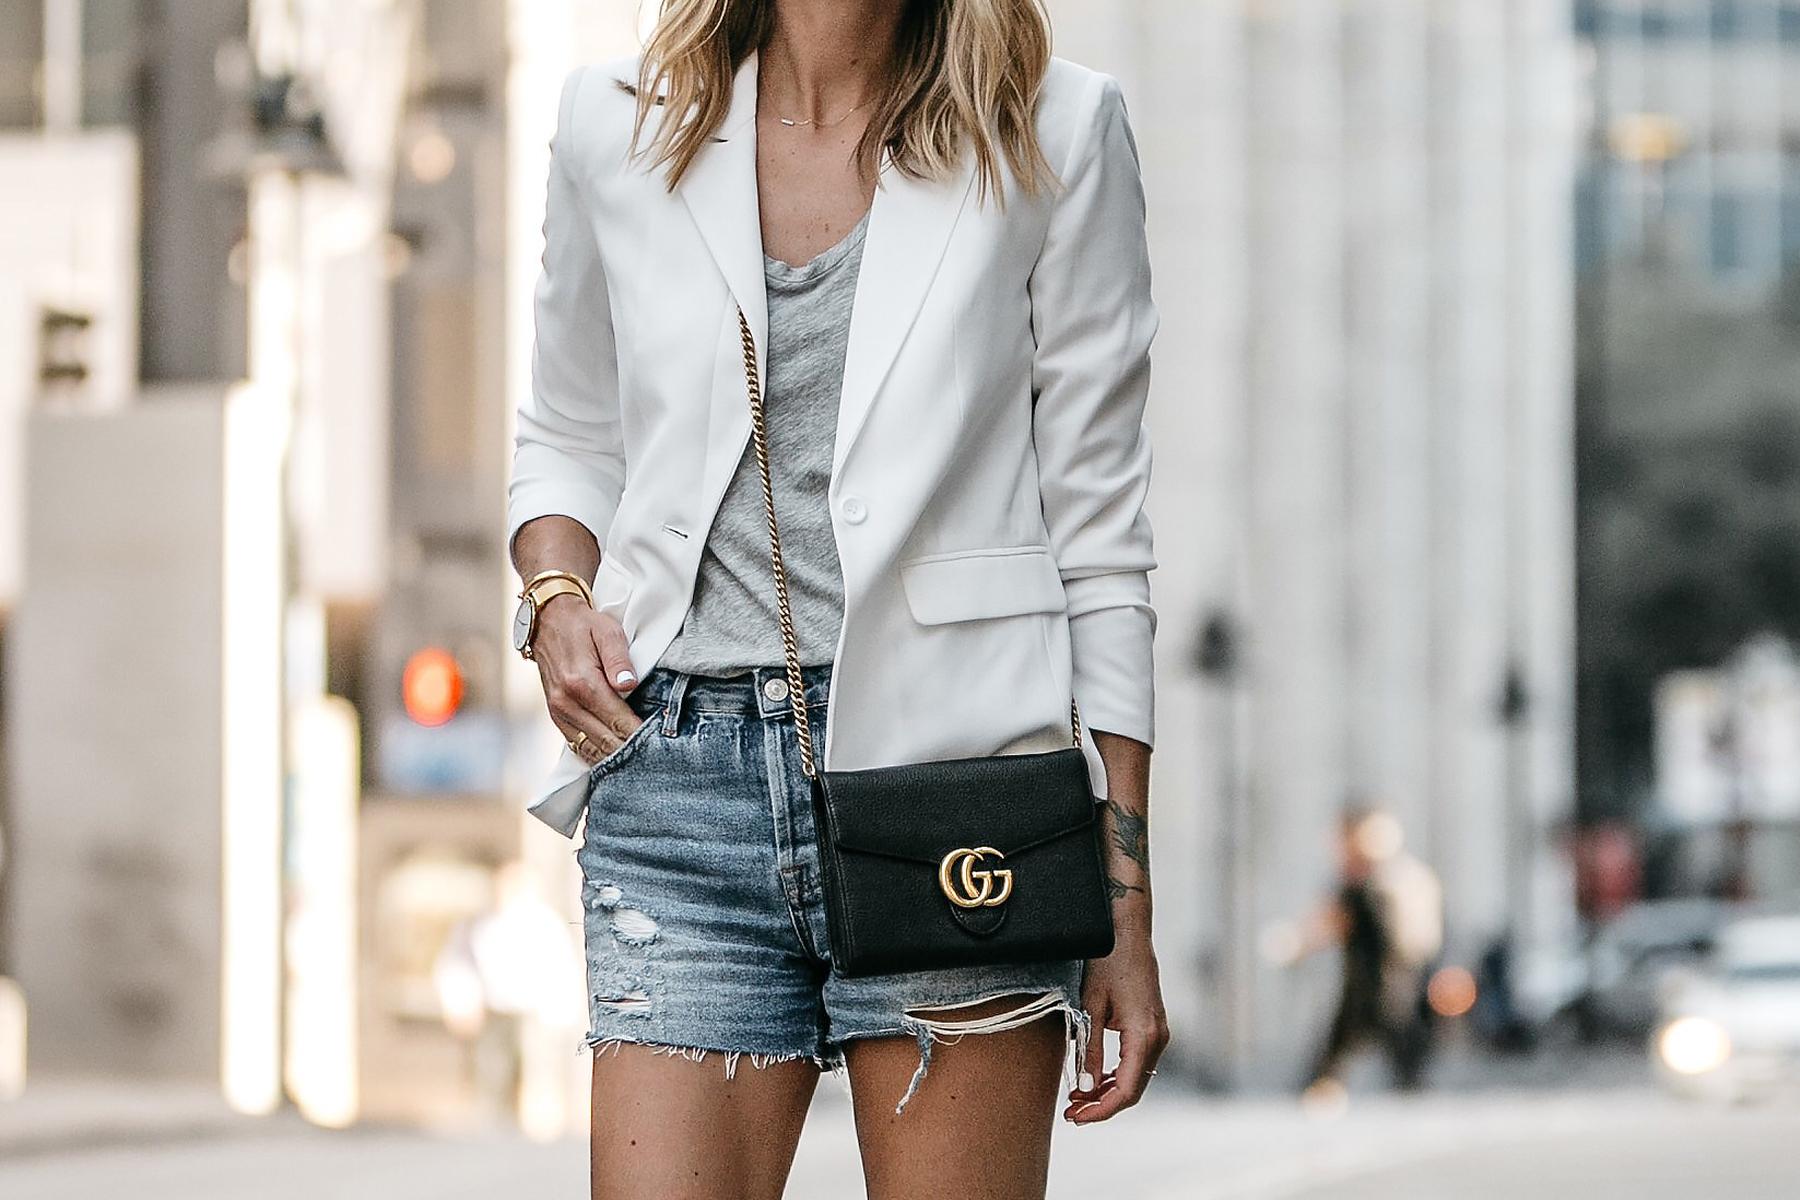 Nordstrom White Blazer Everlane Grey Tshirt Topshop Ripped Denim Shorts Outfit Gucci Marmont Handbag Fashion Jackson Dallas Blogger Fashion Blogger Street Style